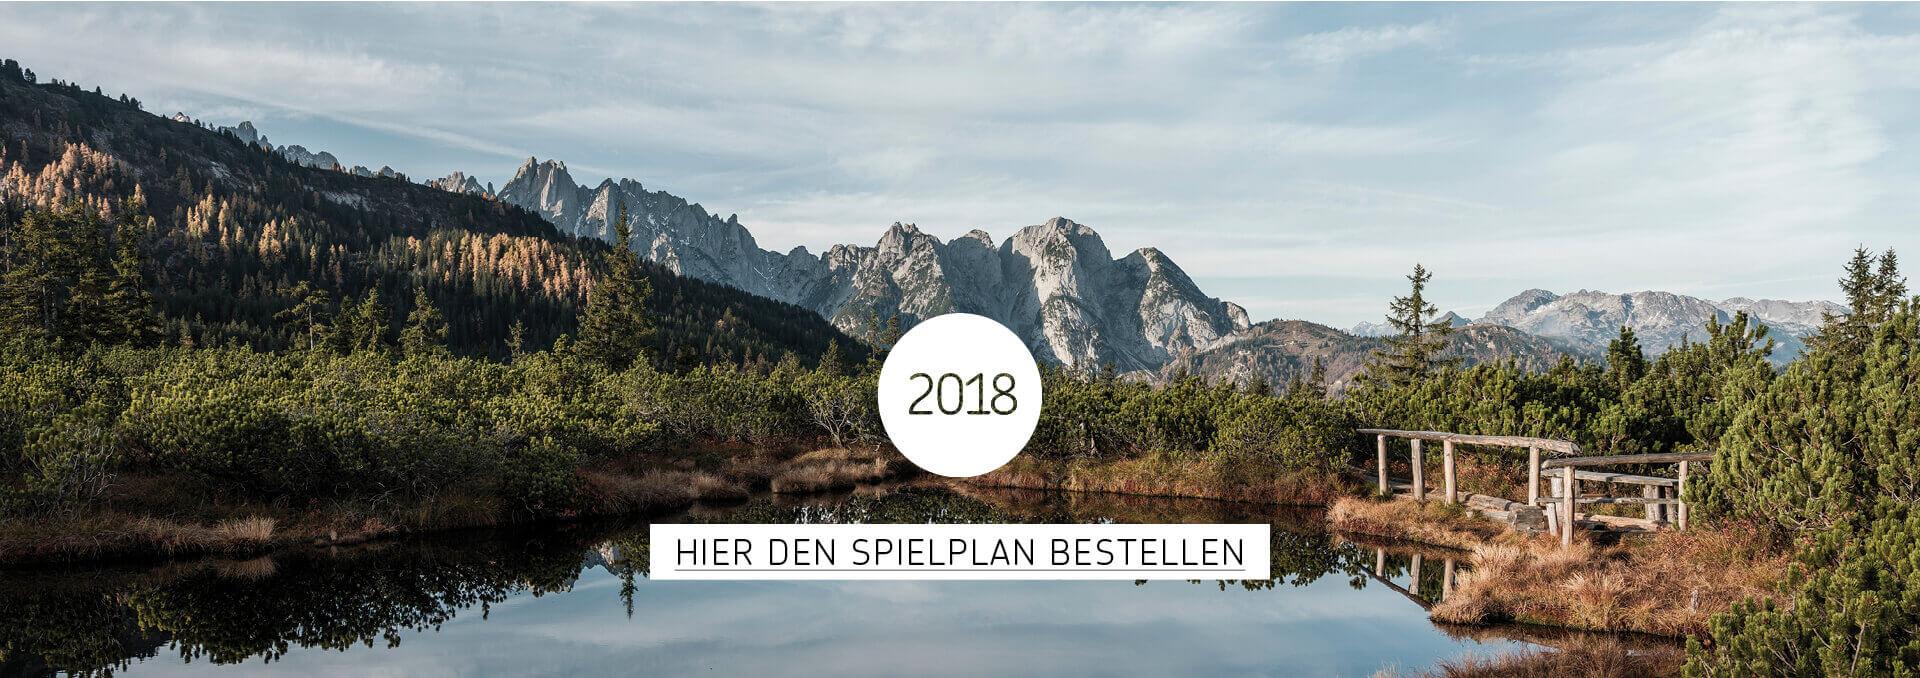 nasp-sujet-2018